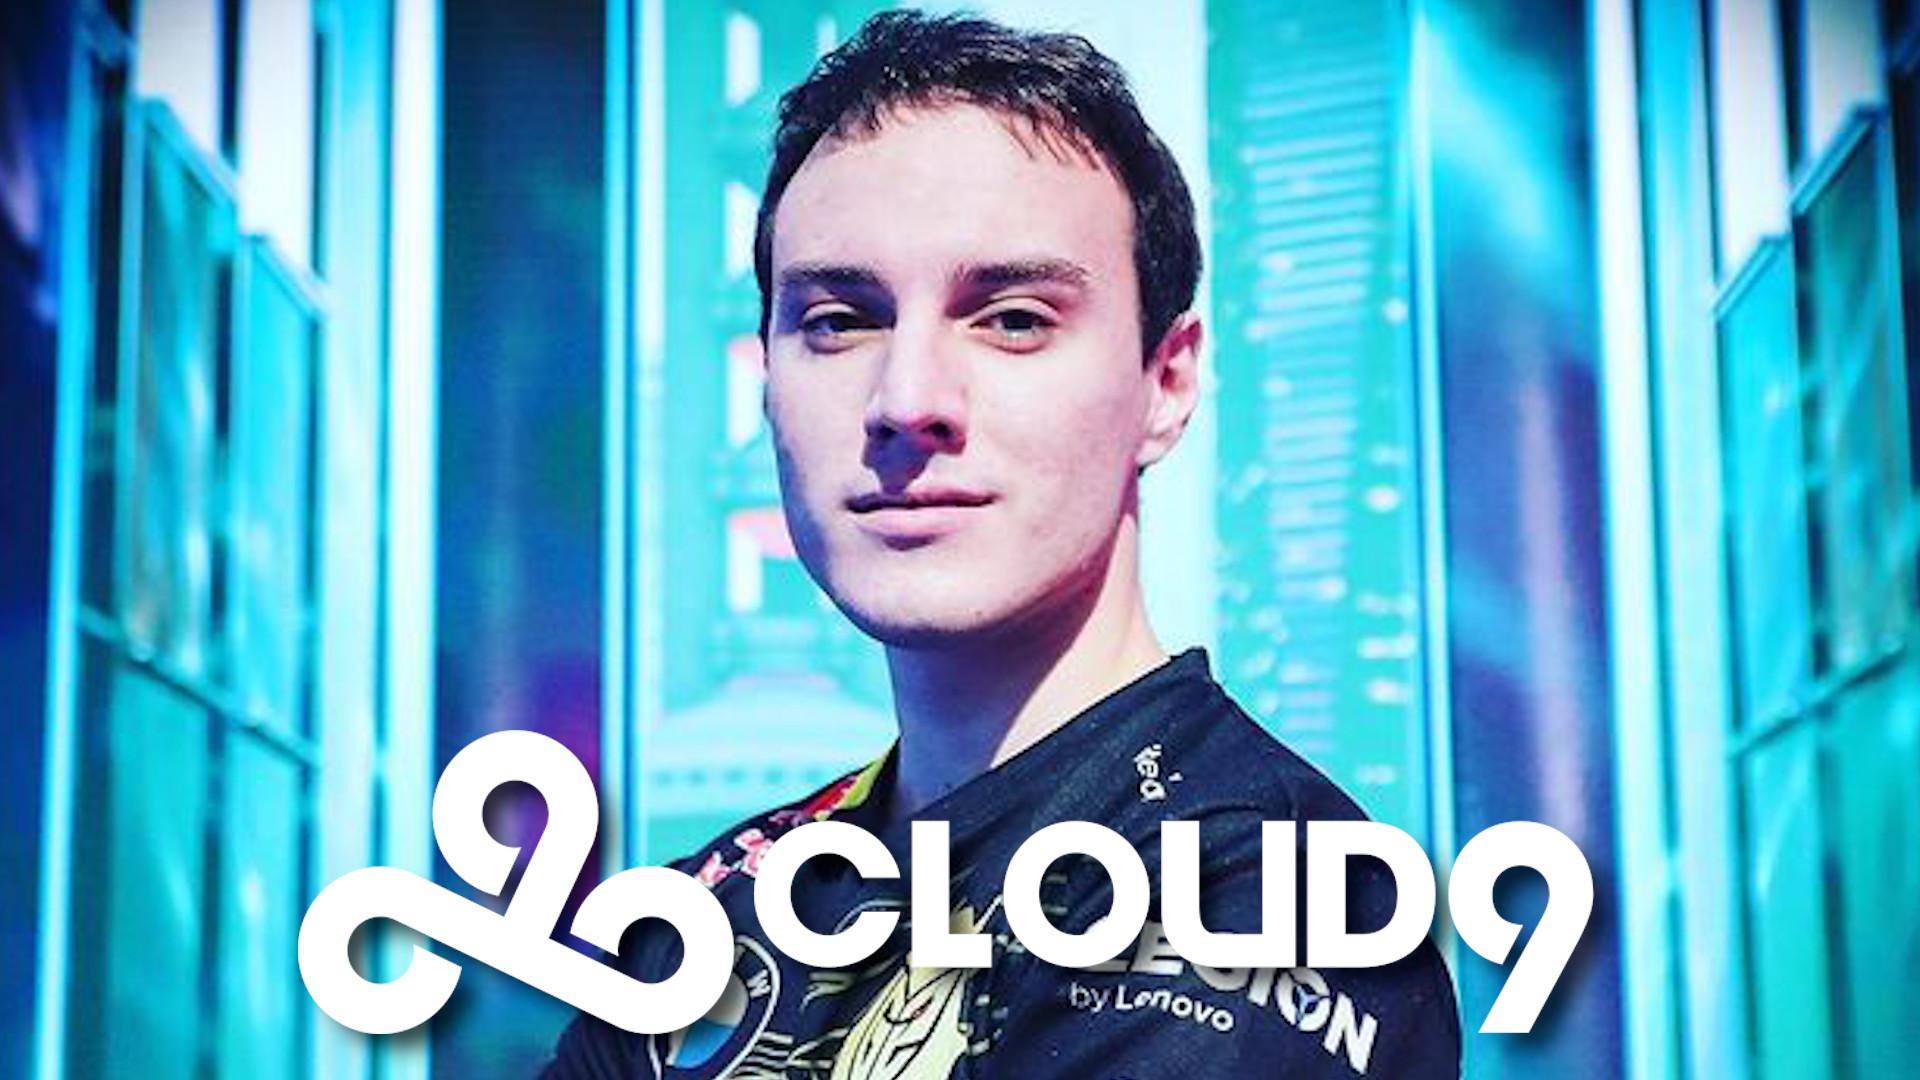 cloud9 announce g2 perkz